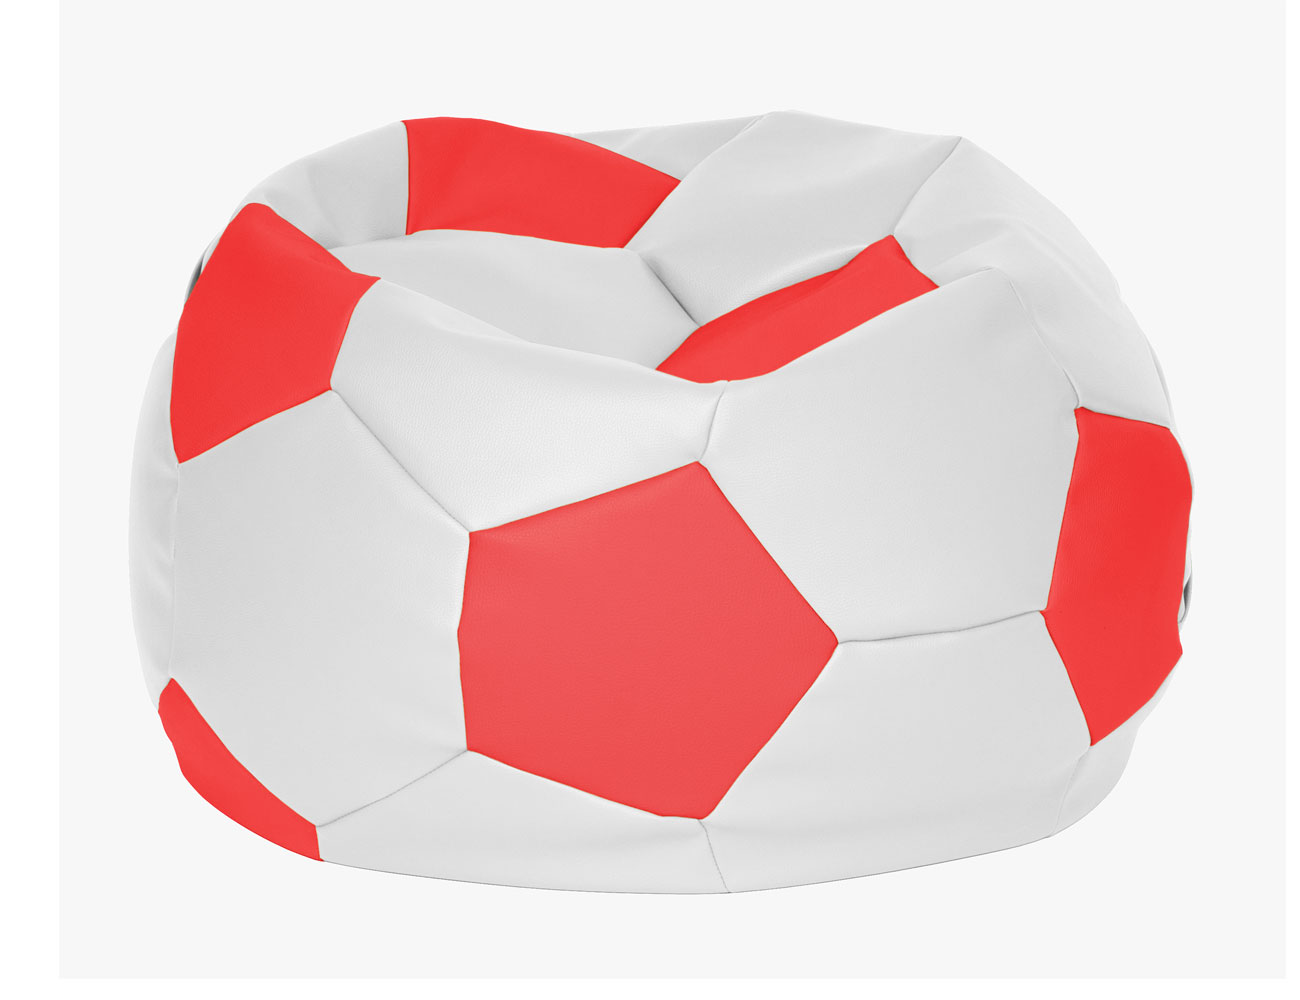 Puff pelota futbol roja blanca